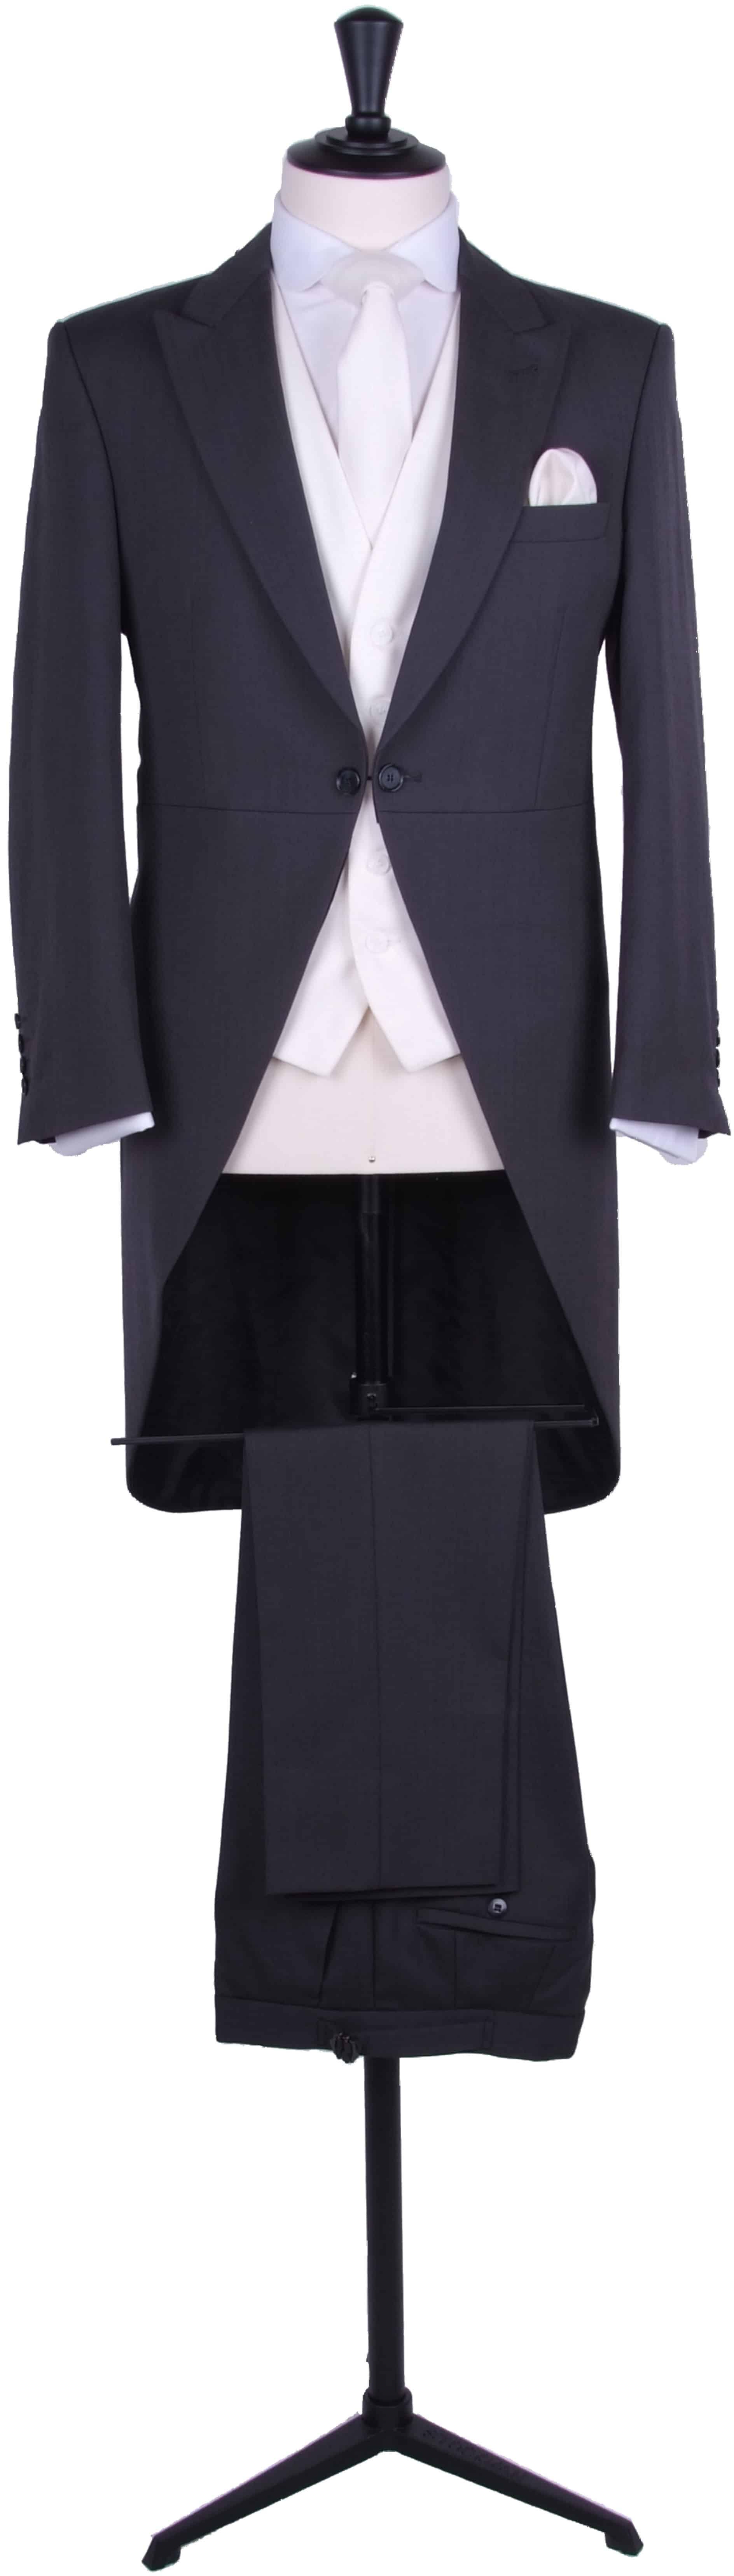 Classic formal wear